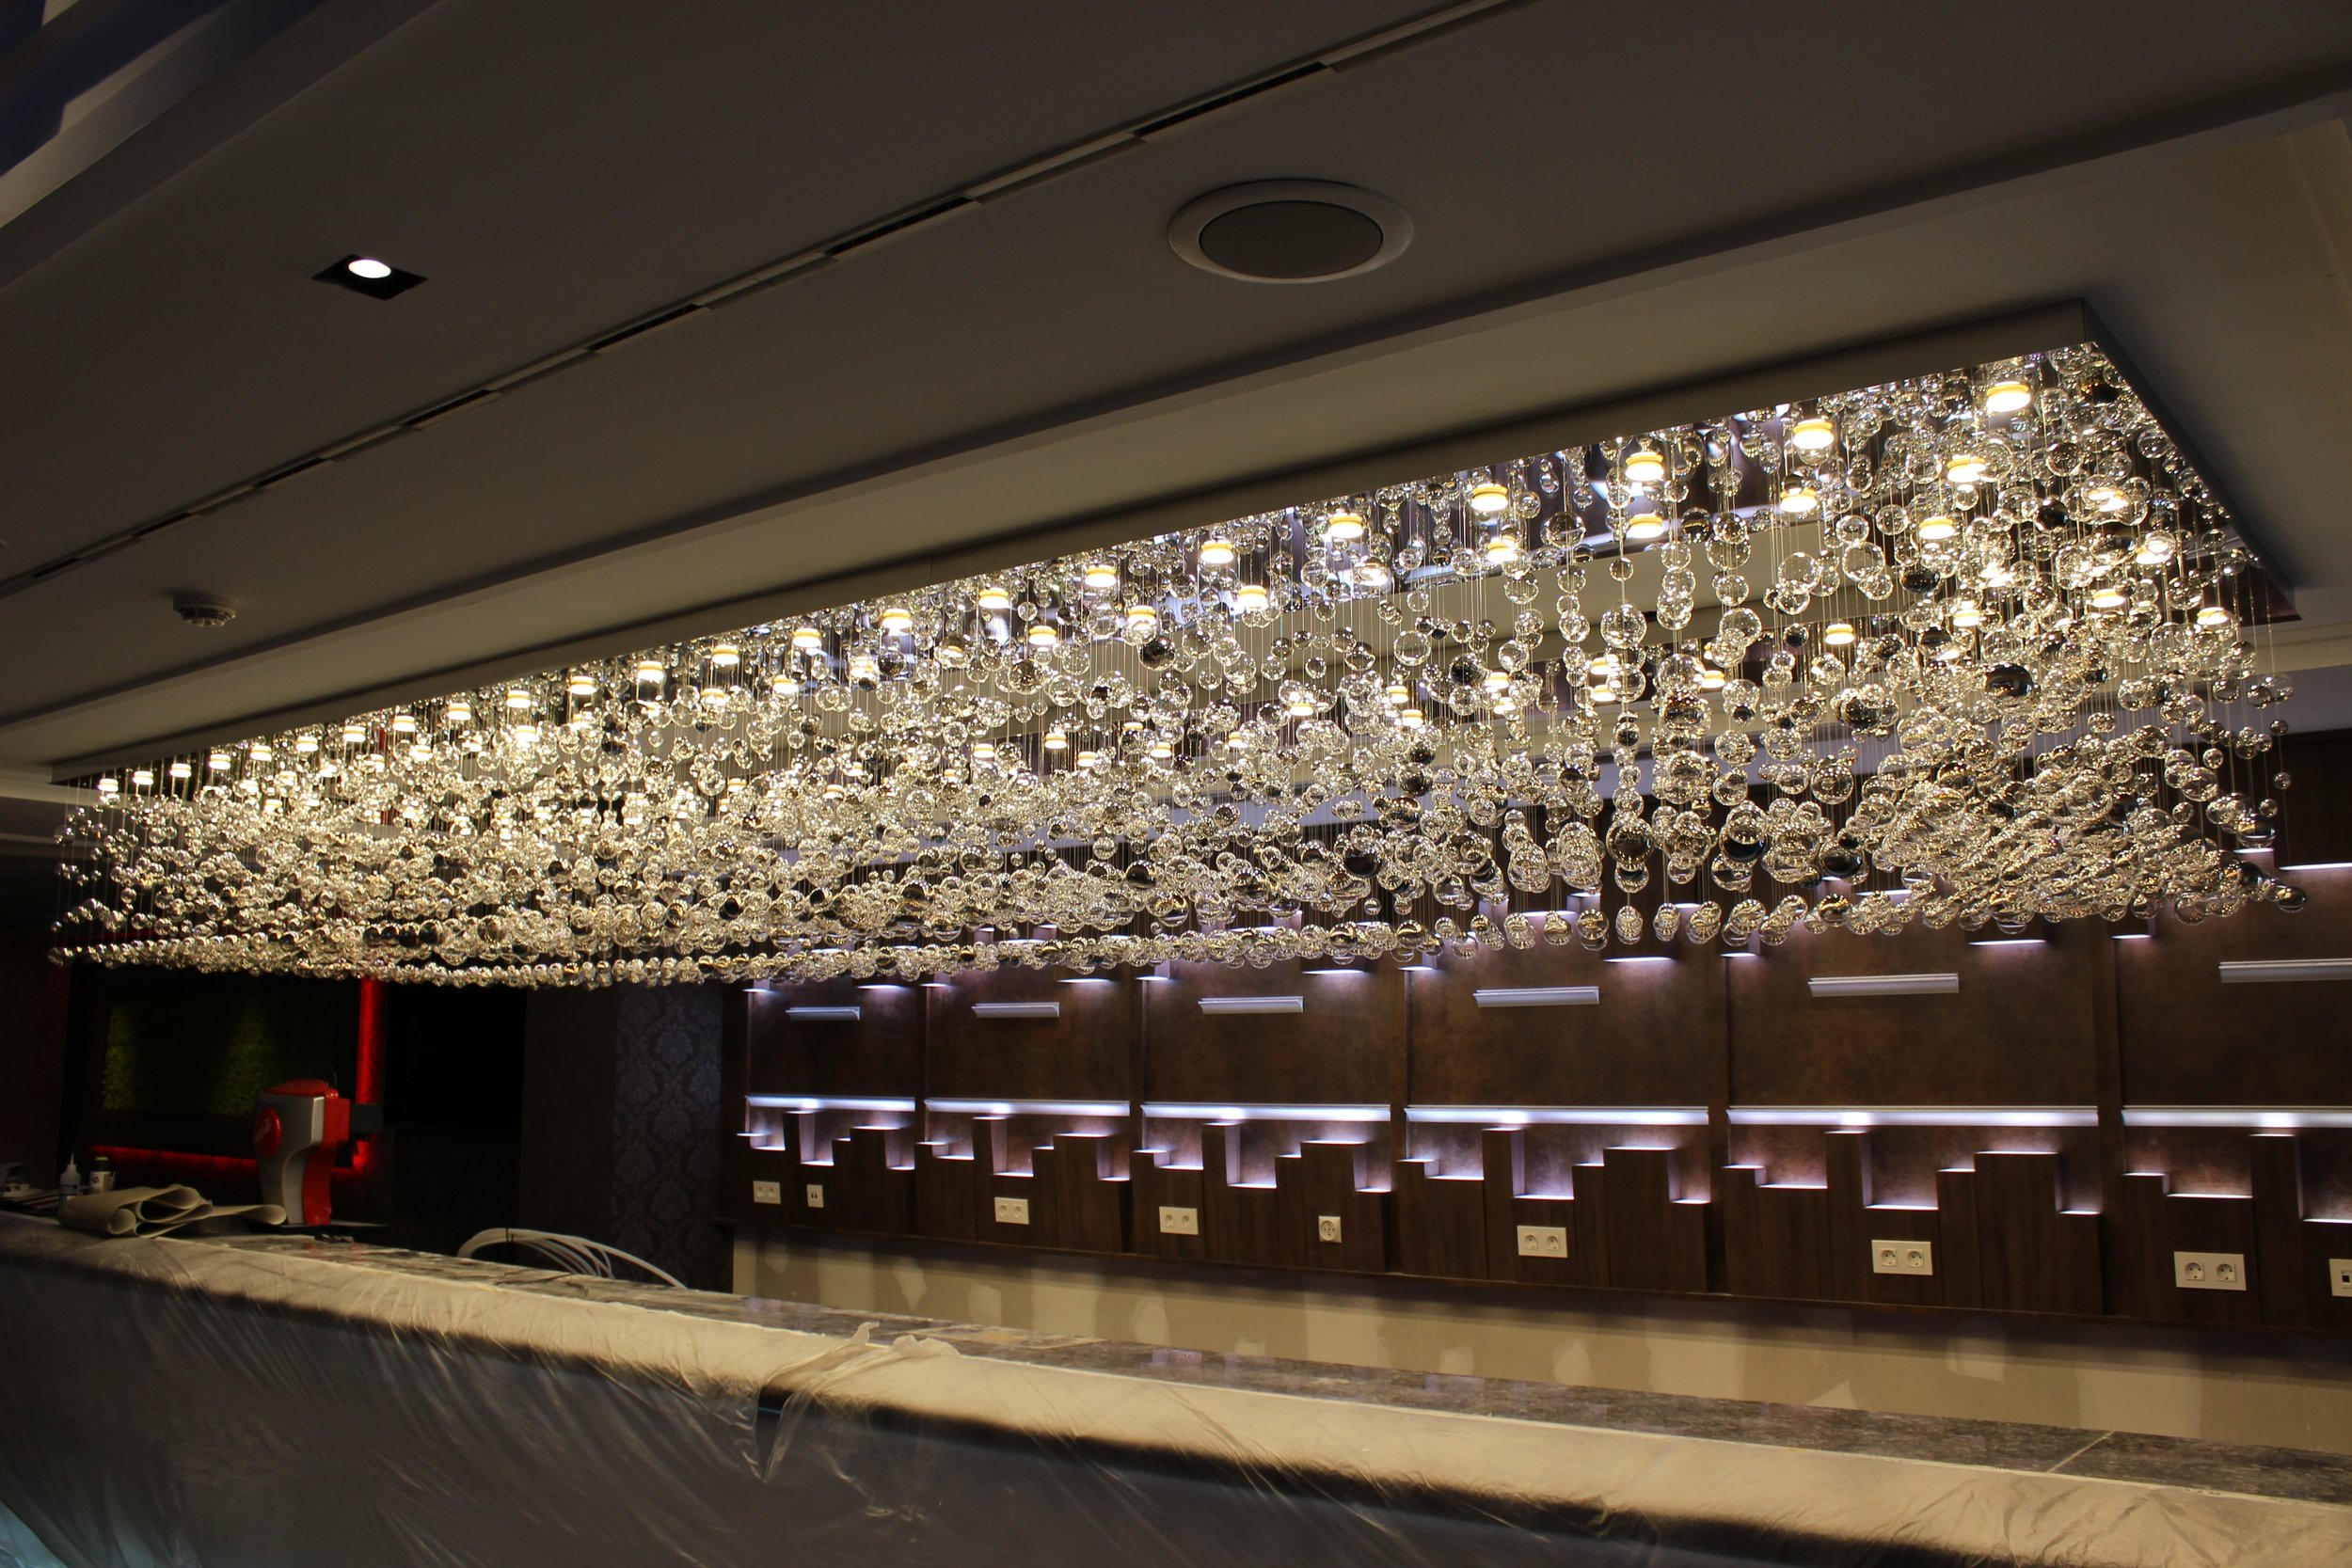 casino-spain-wranovsky-crystal-chandeliers-2.JPG